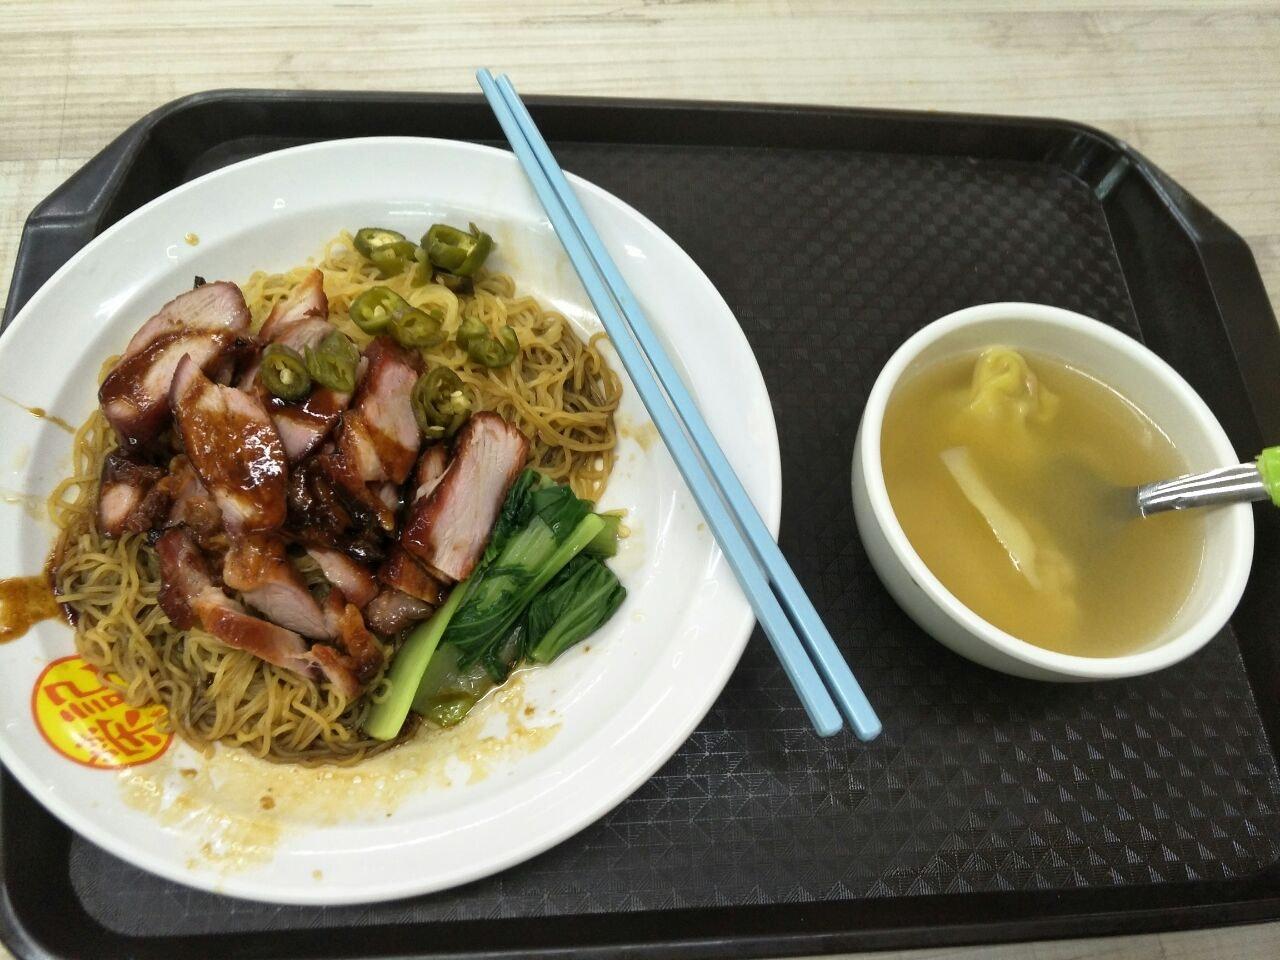 Tasty Food In Asia